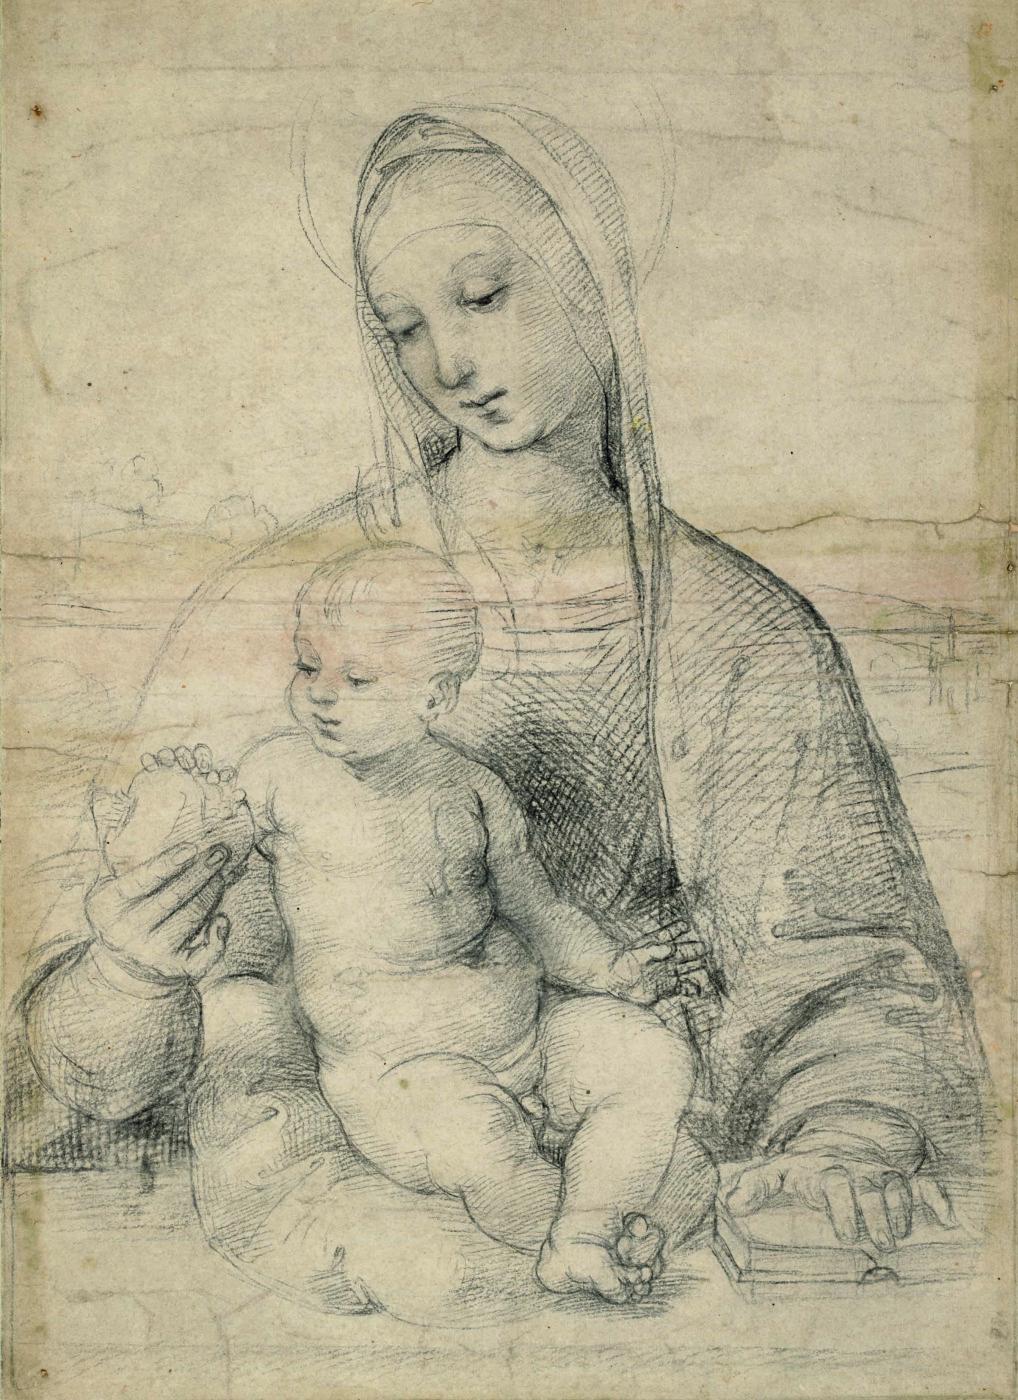 Raphael Sanzio. Madonna with a pomegranate